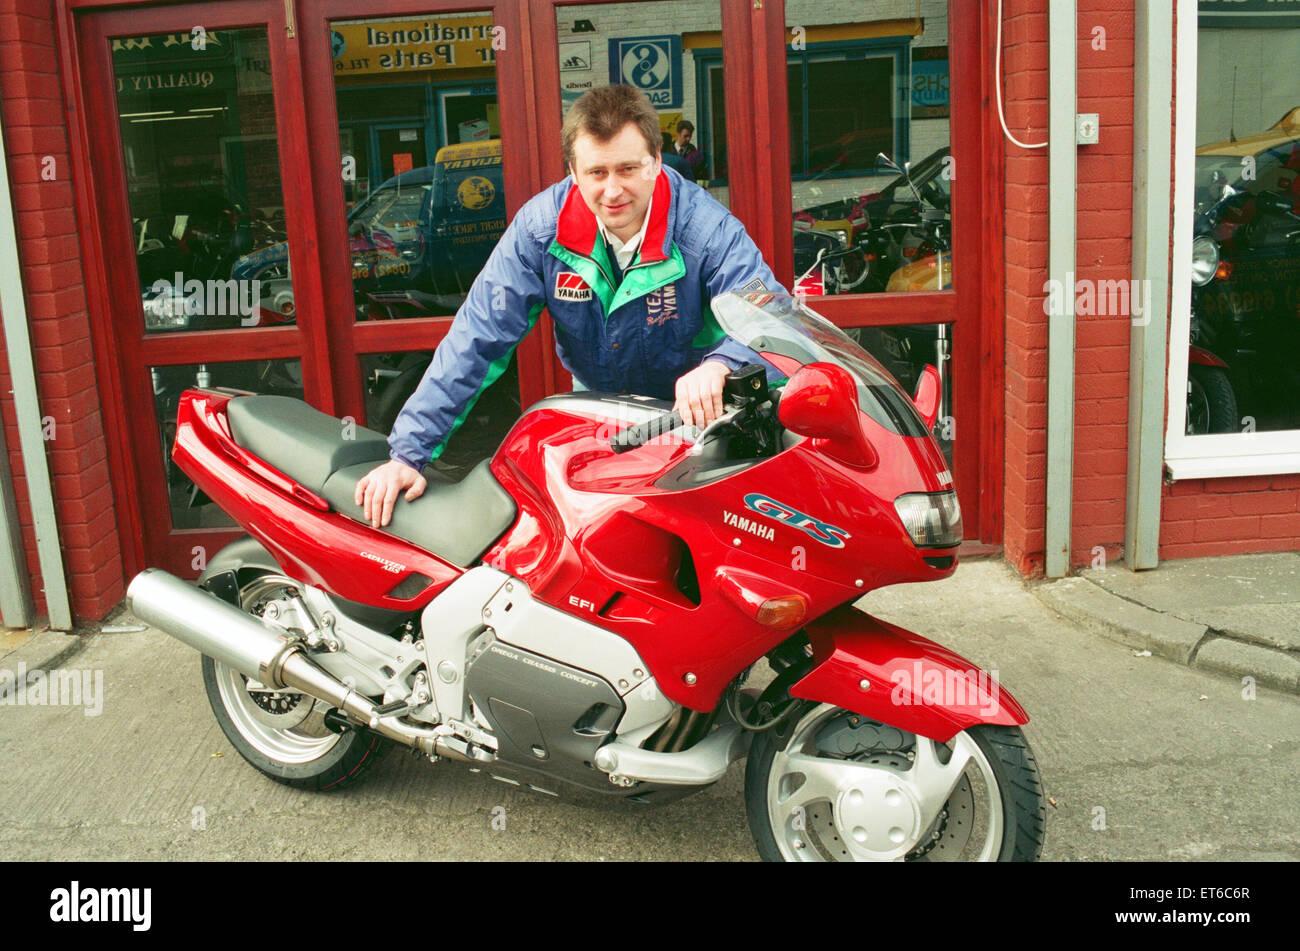 Gary Jordinson of Tillsons motor cycle shop, Stockton, with the Yamaha GTS 1000. 15th February 1993. - Stock Image